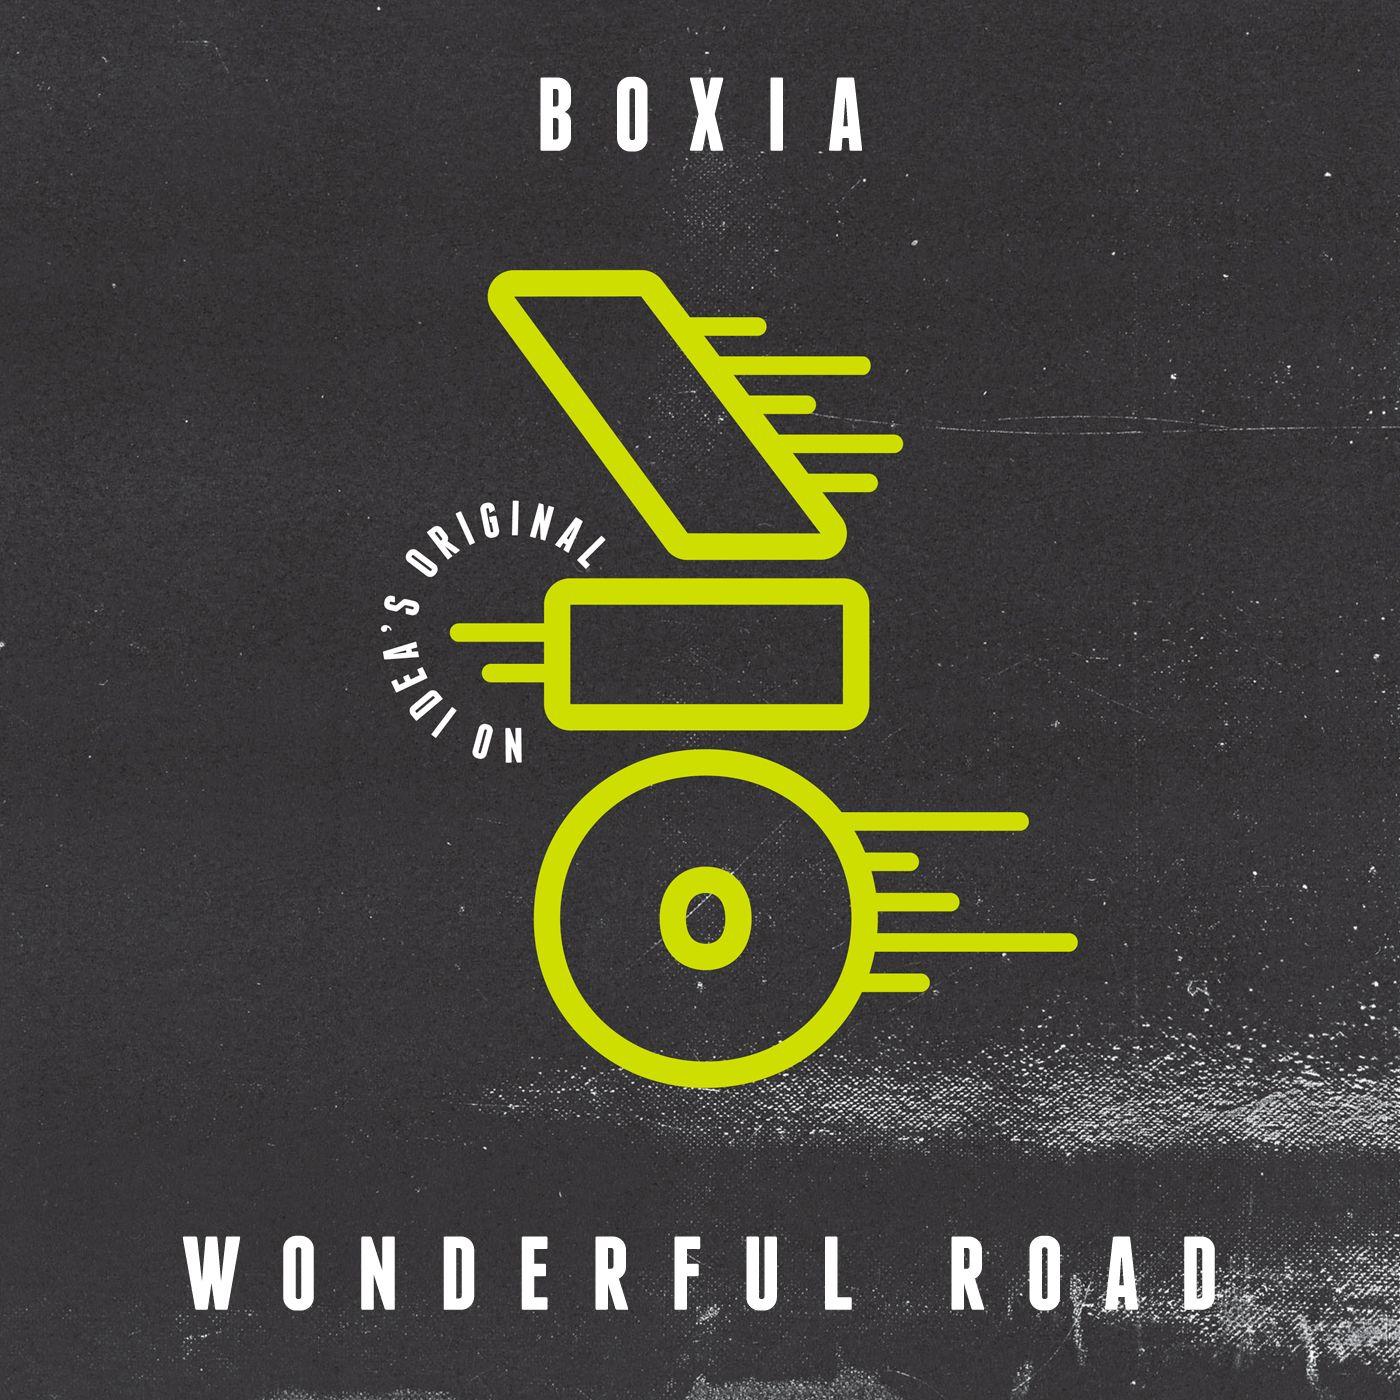 packshot_boxia_-_wonderful_road_ep_-_no_ideas_original.jpg